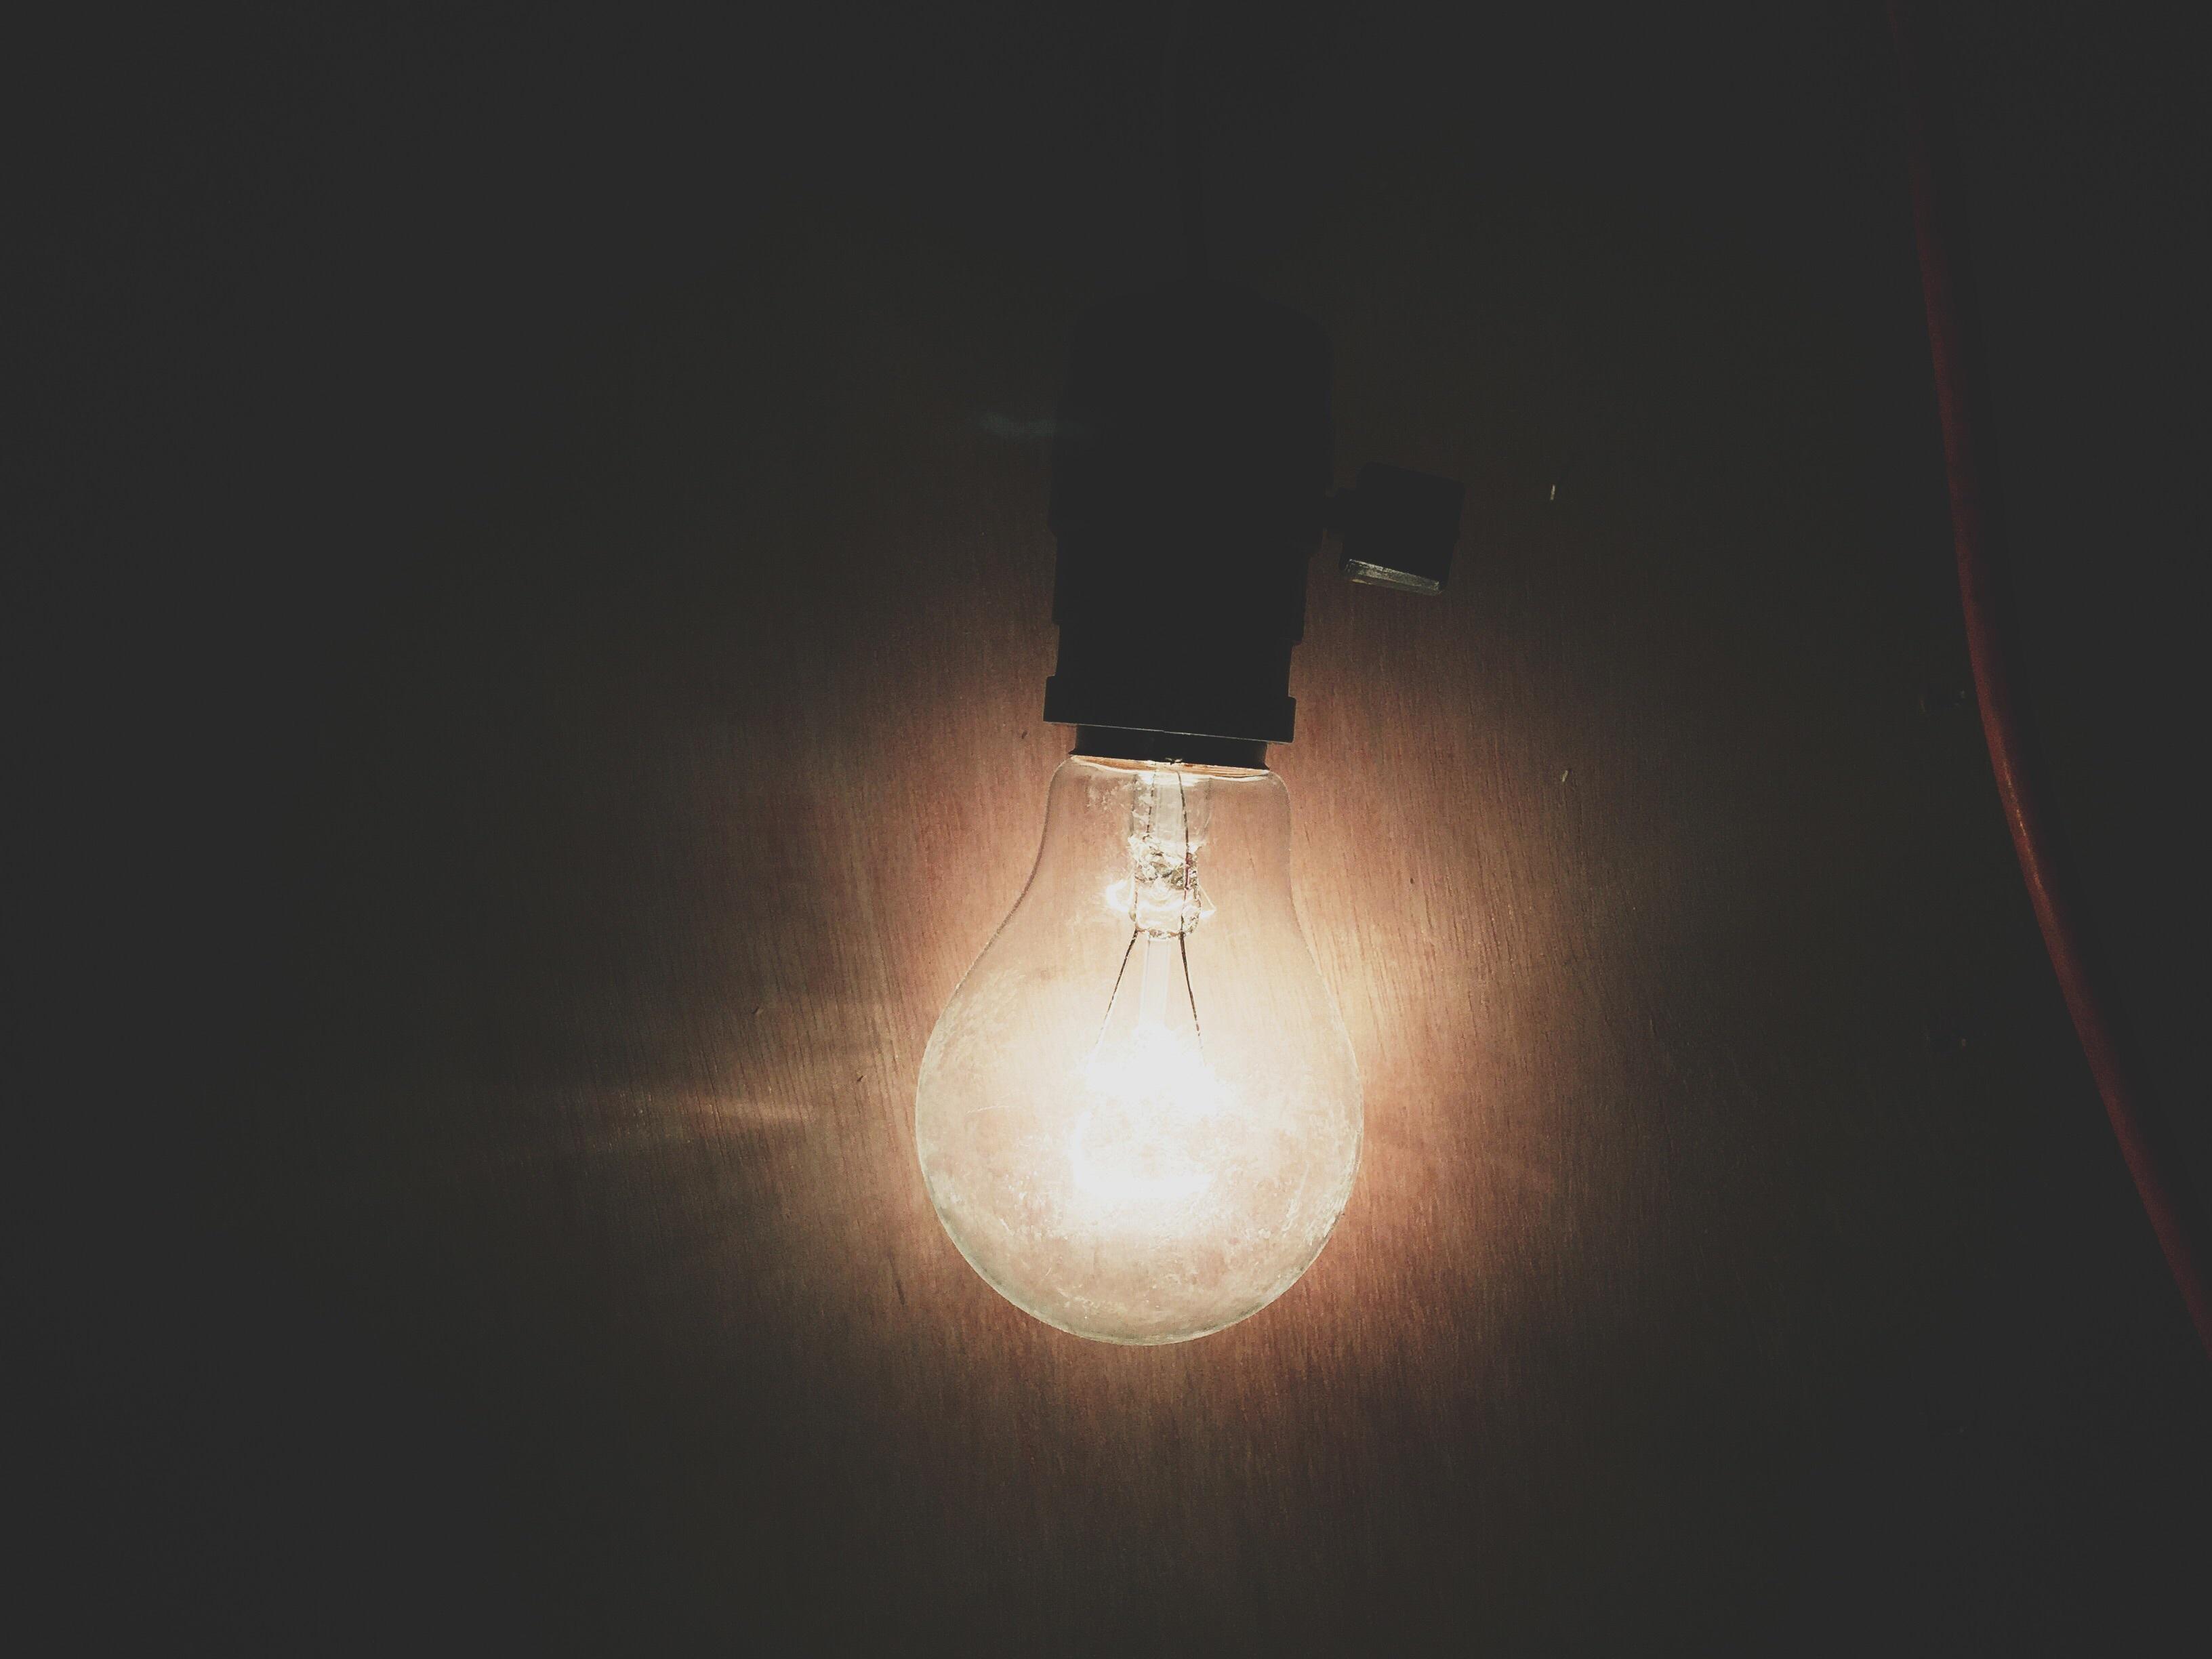 Light White Night Sunlight Atmosphere Reflection Darkness Street Lamp Black Bulb Lighting Circle